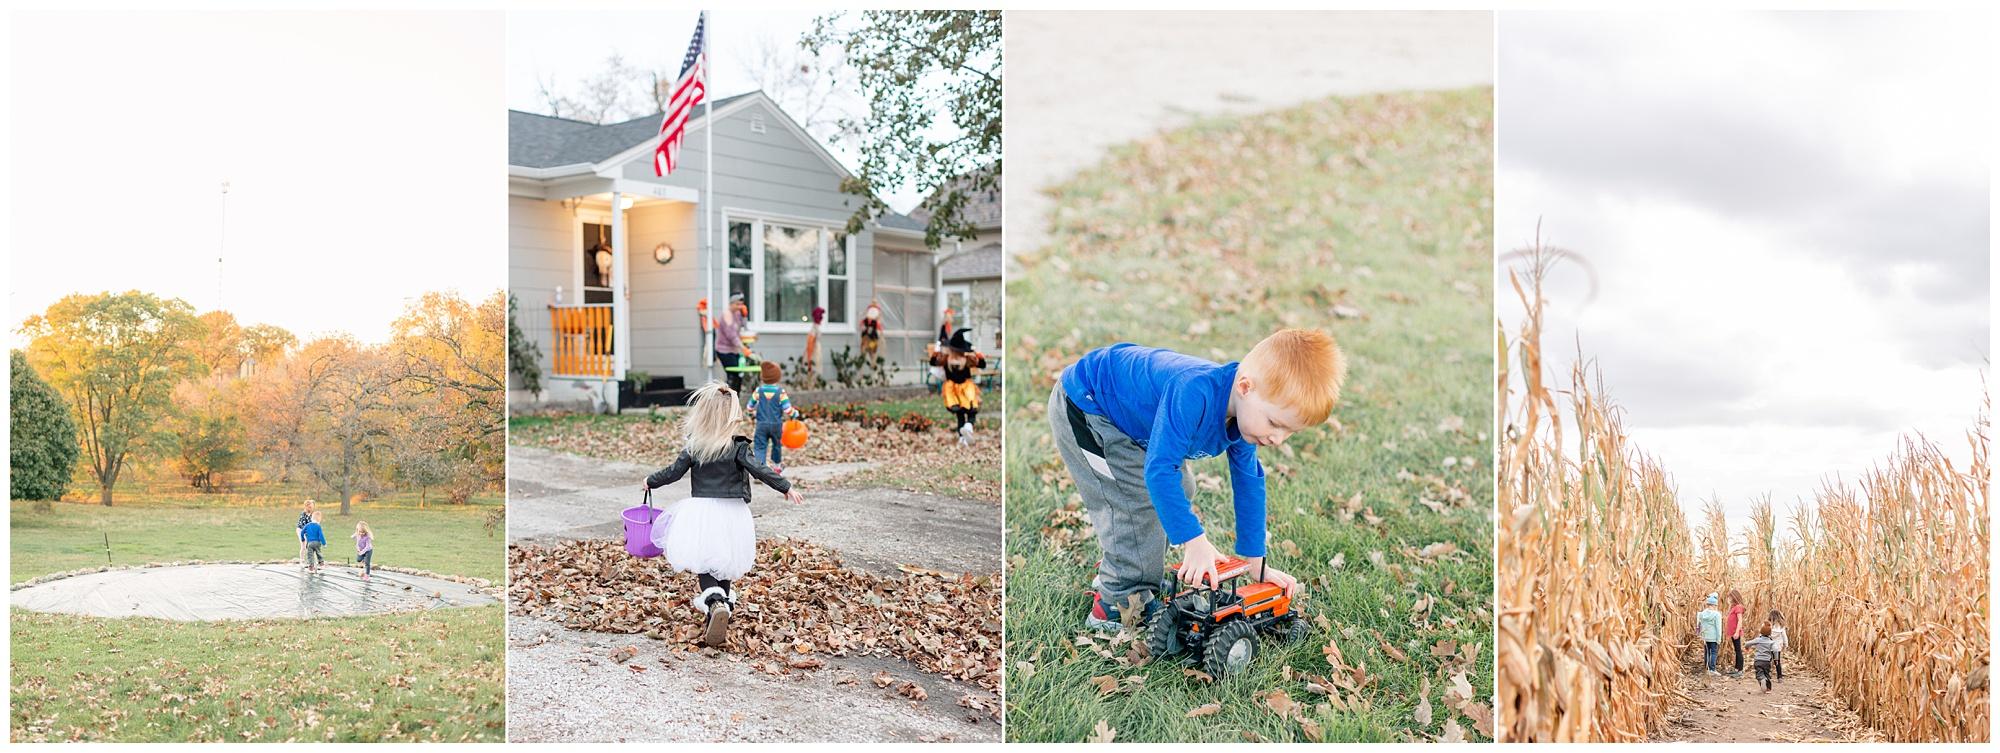 October Family Adventures